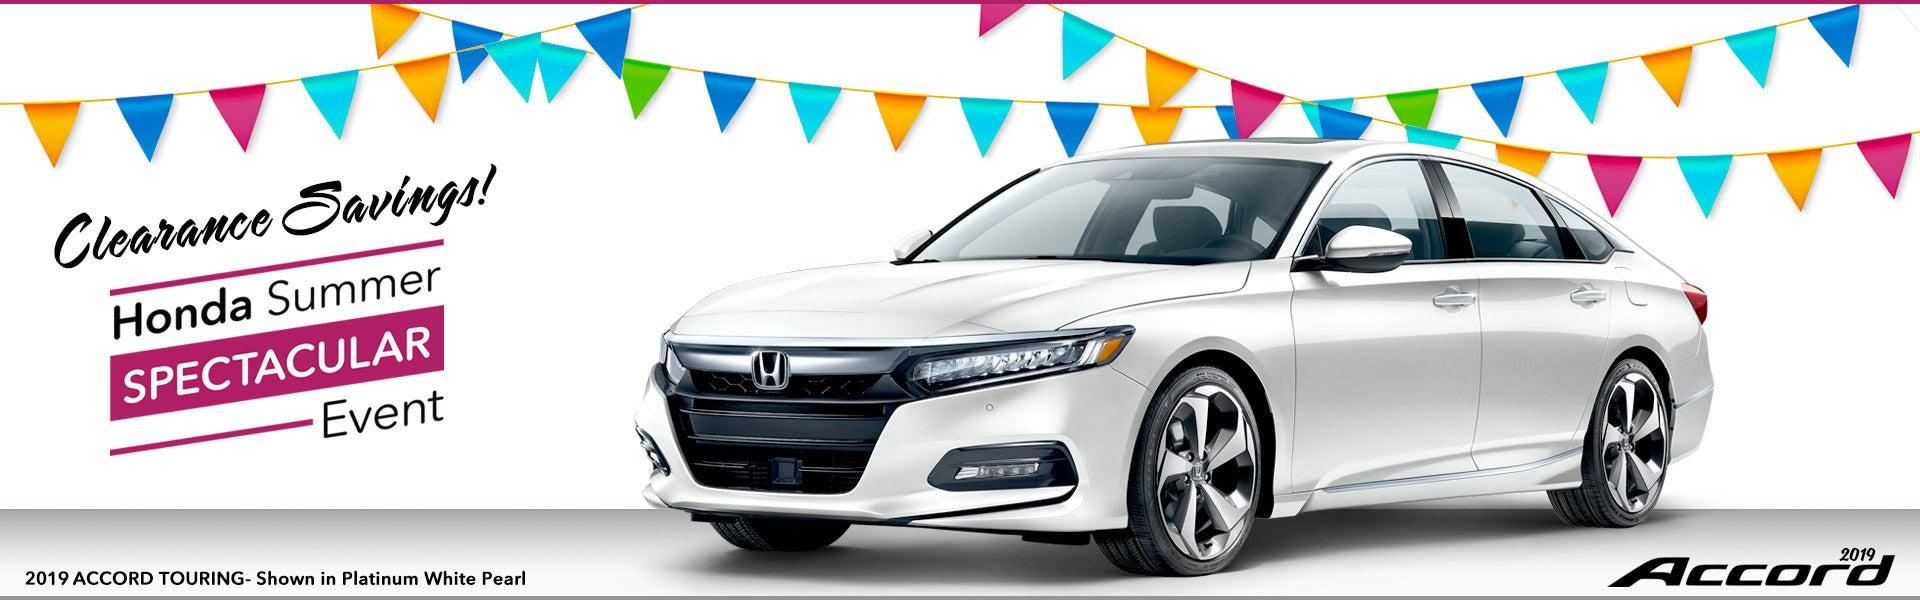 Honda Dealers In Delaware >> Scott Honda Honda Dealer West Chester Pa 1 502 Google Reviews